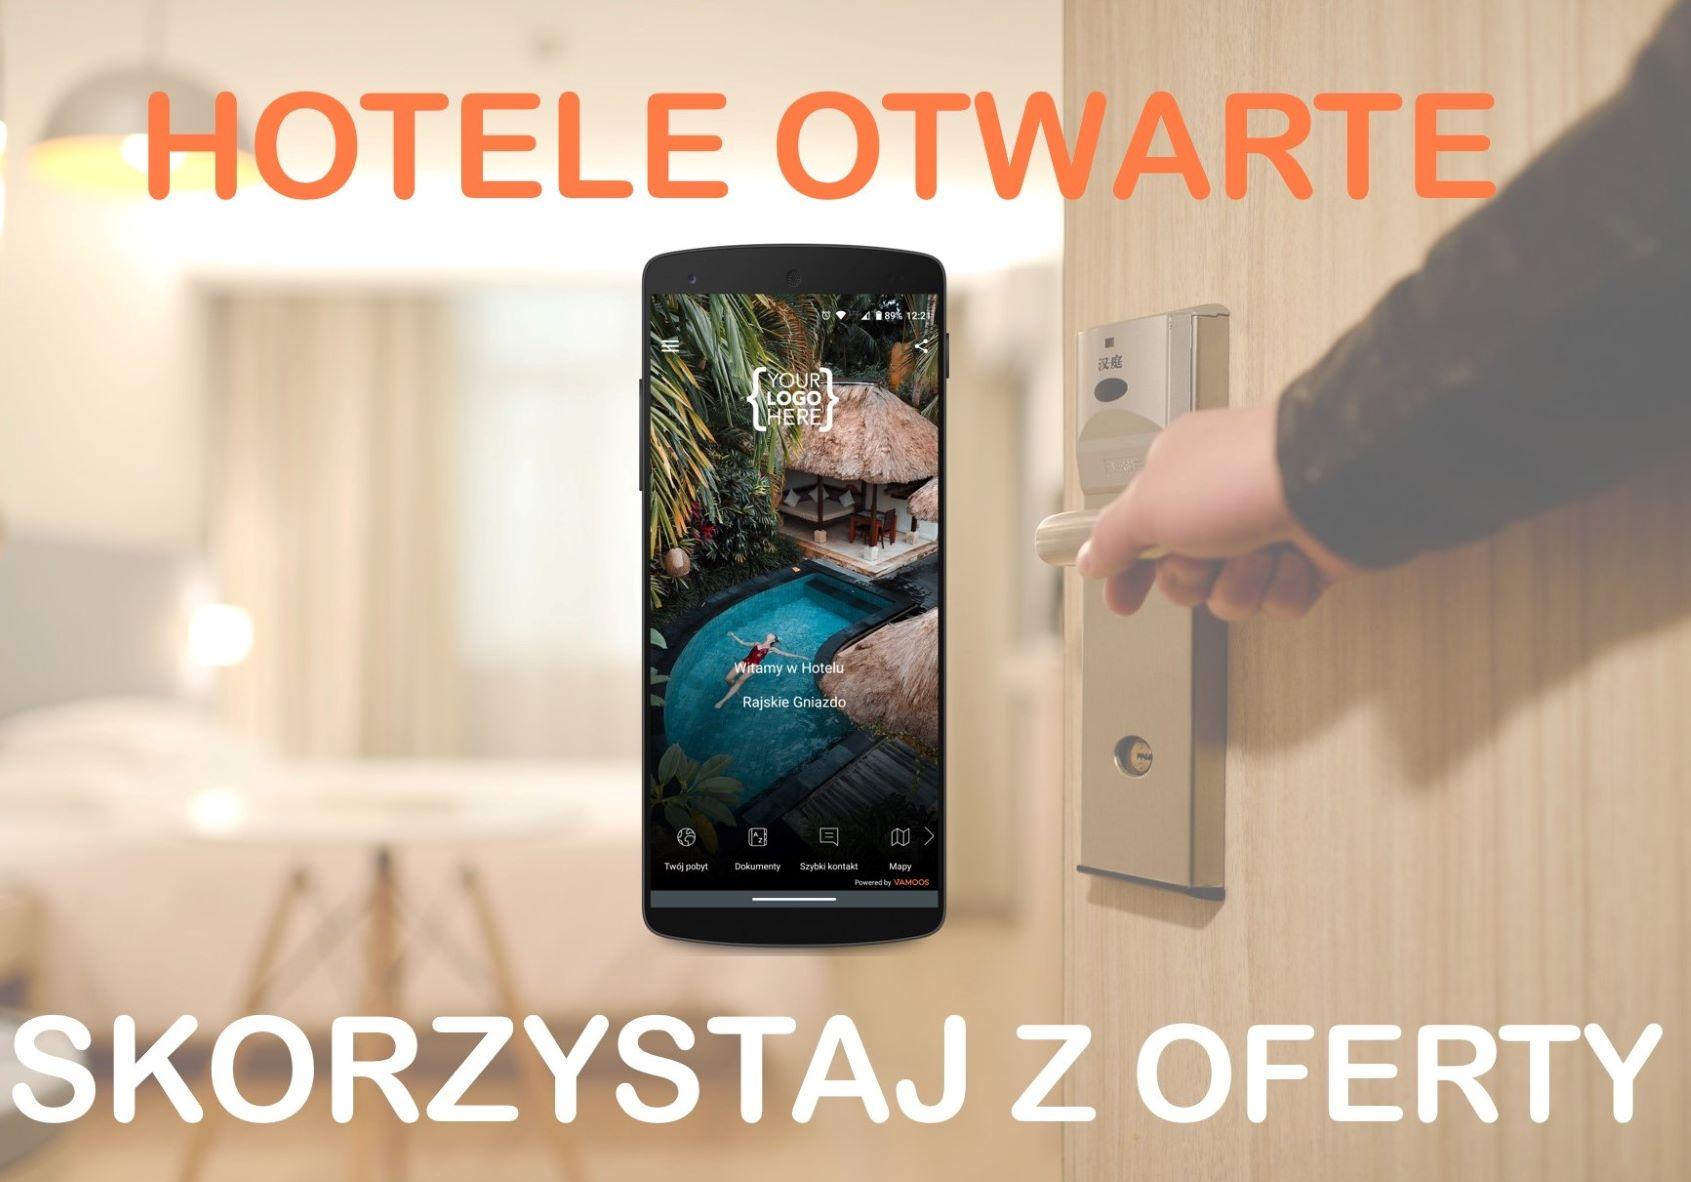 otwarcie hoteli